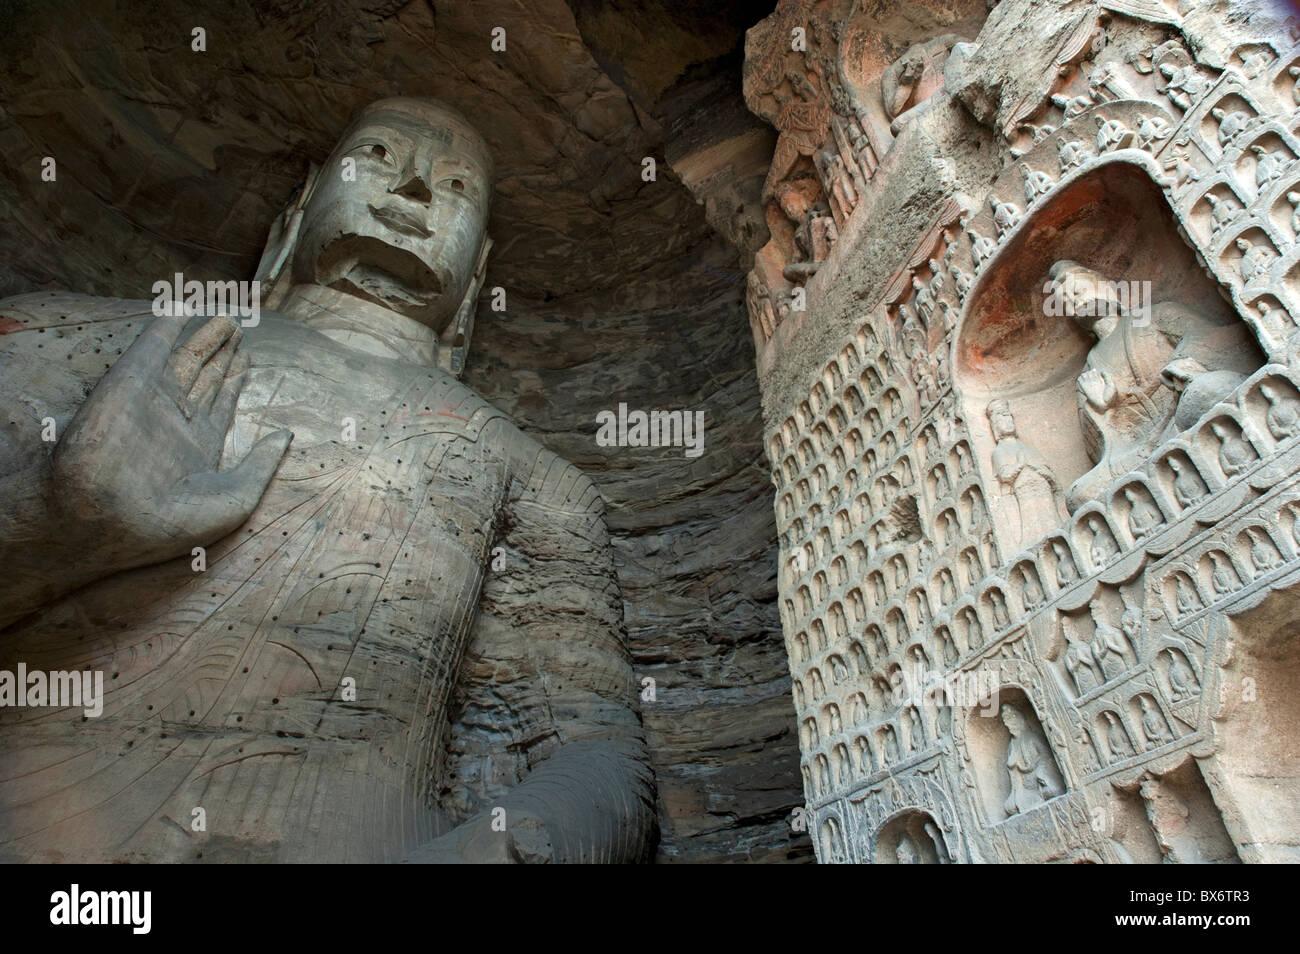 Yungang Grottoes - Giant Buddha statue carved inside the ancient Yungang Grottoes, Datong, Shanxi, China. - Stock Image